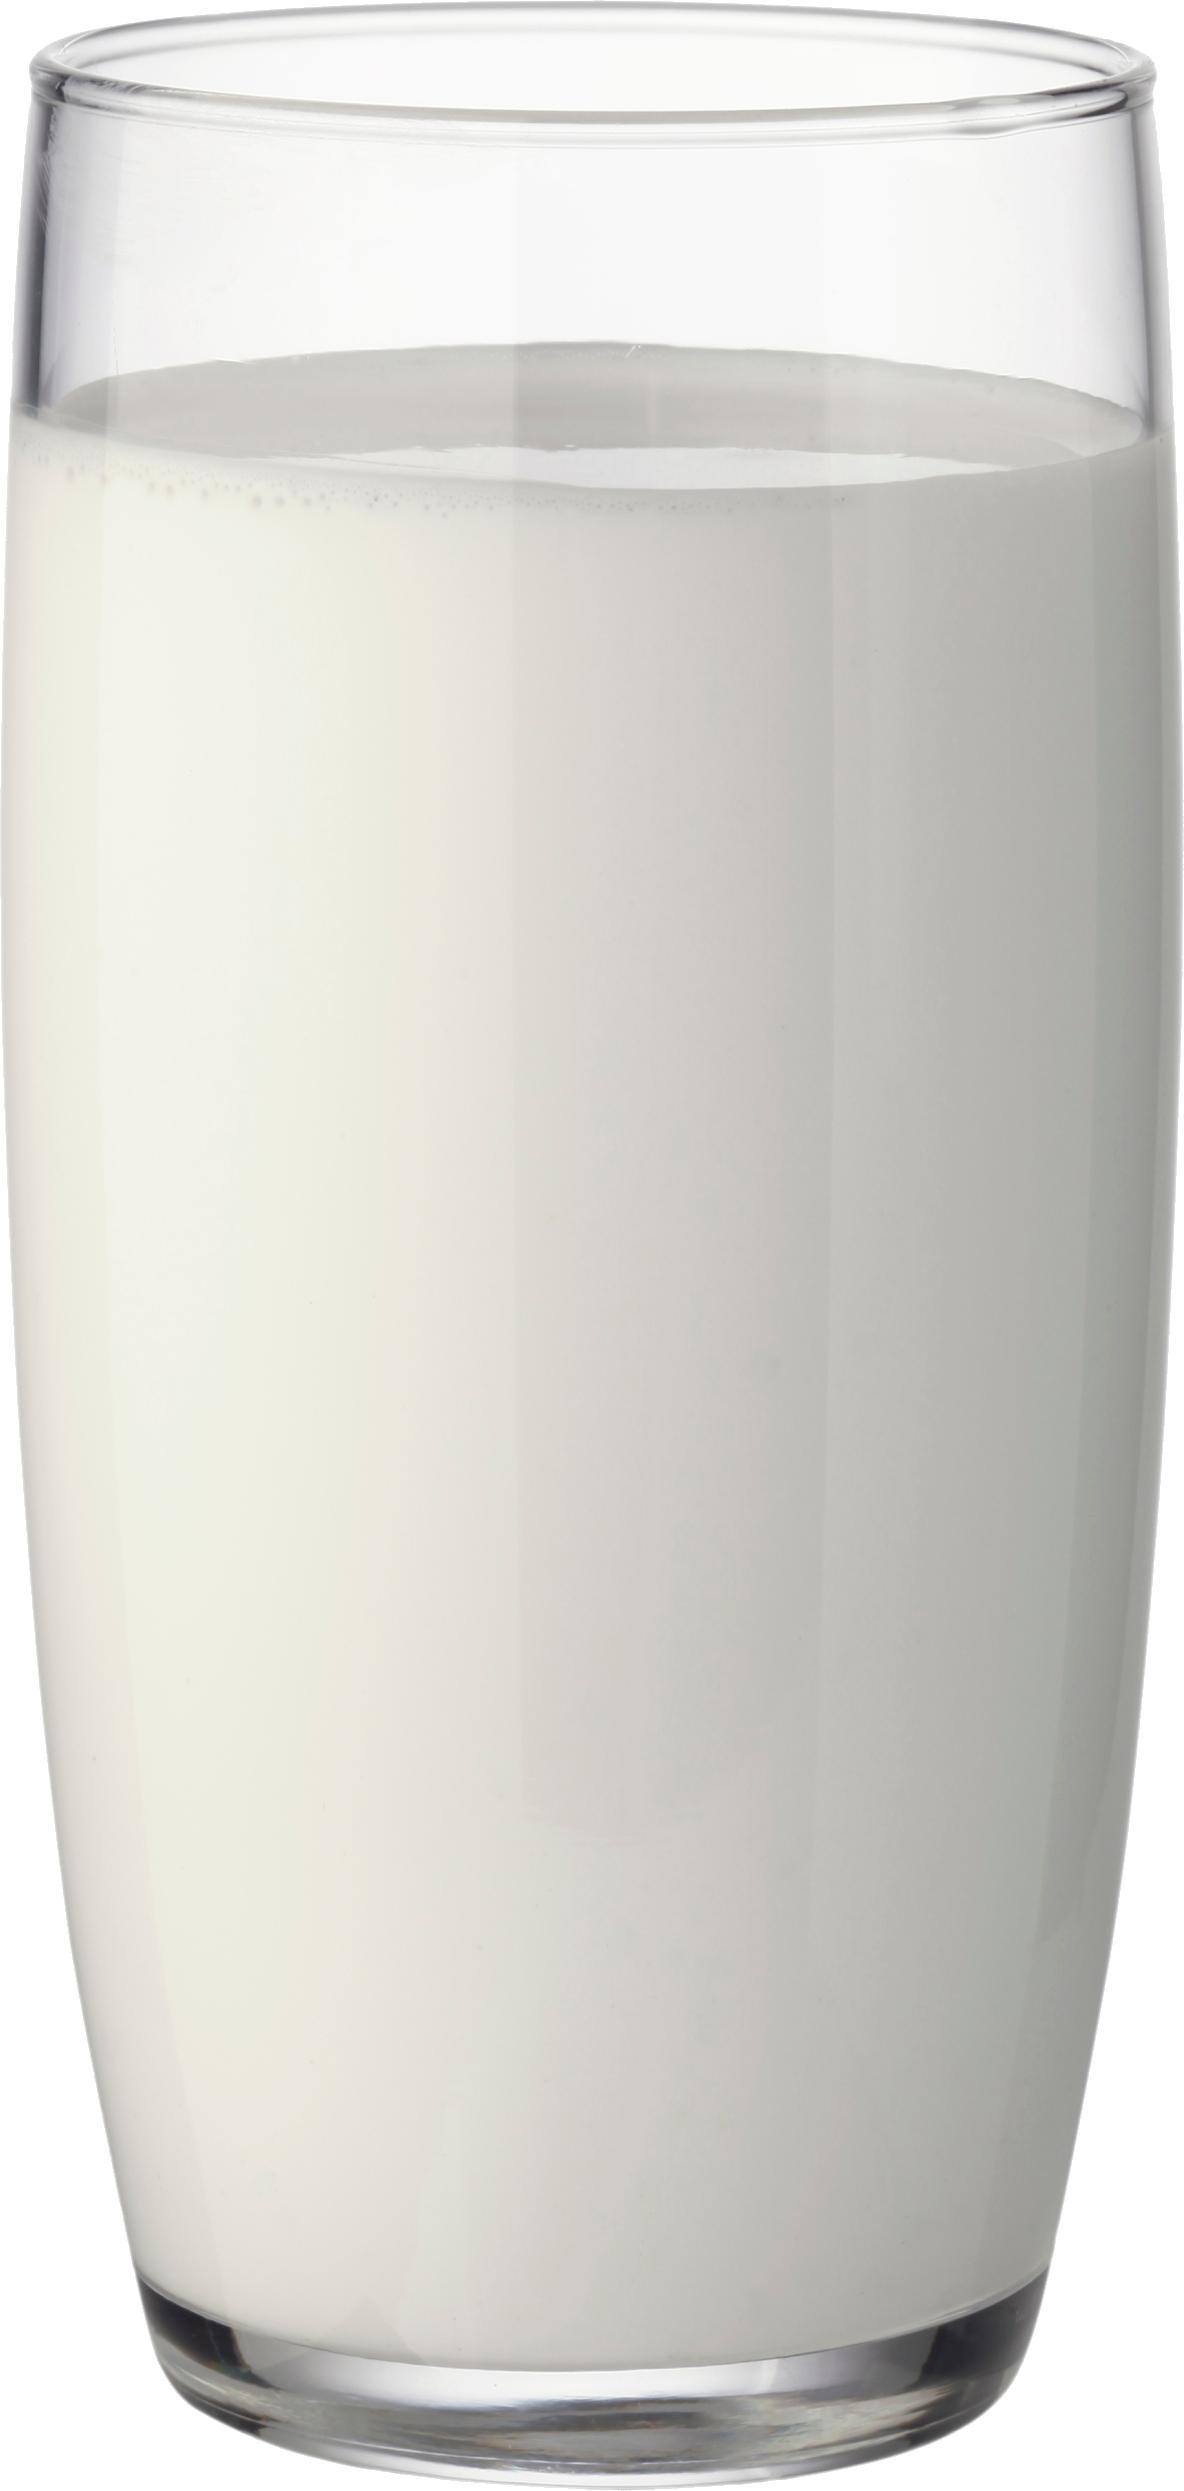 Clipart milk liquid object. Png image purepng free